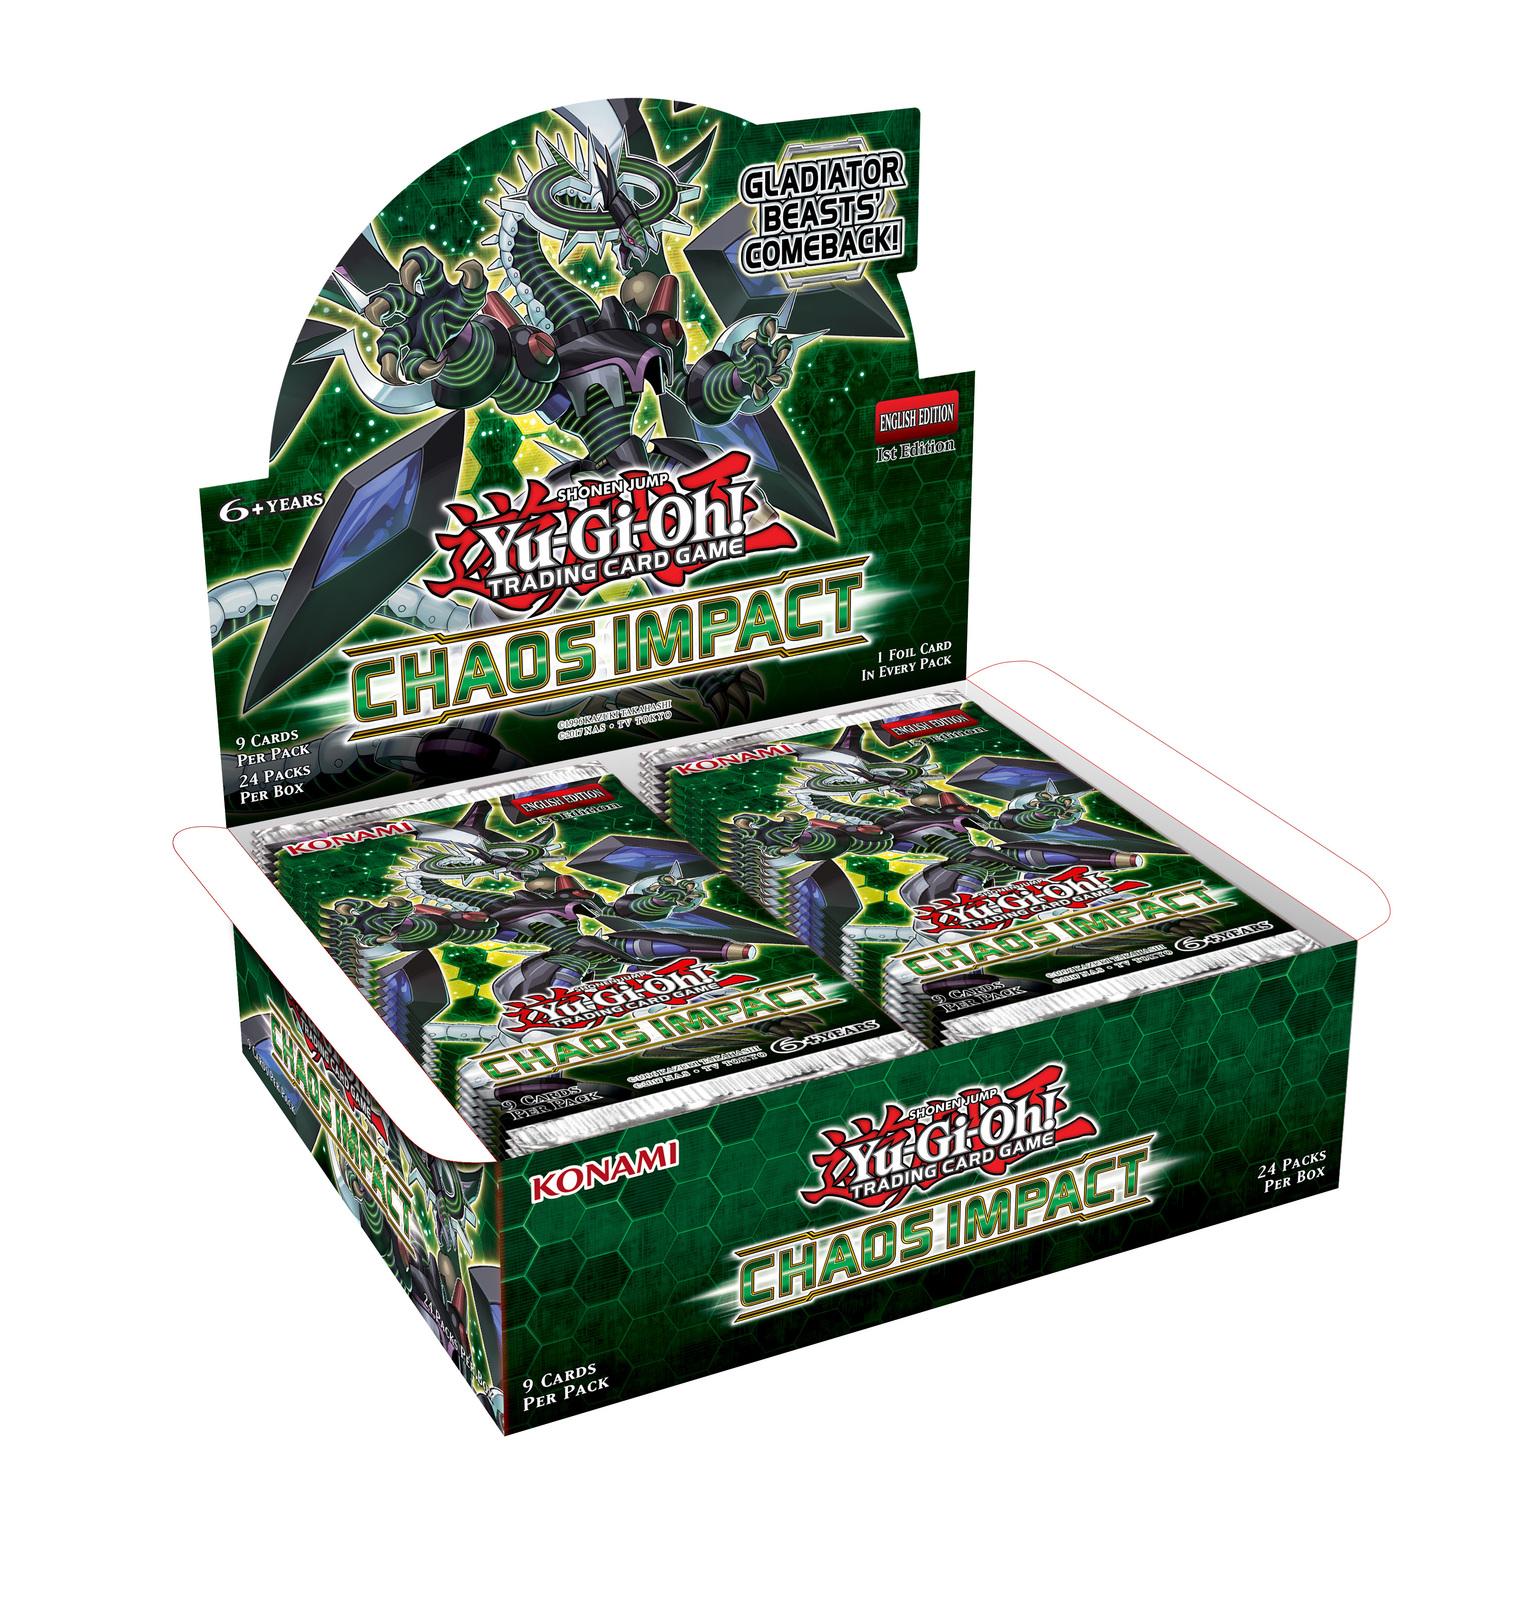 Yu-Gi-Oh! Chaos Impact Booster Box (24 Packs) image